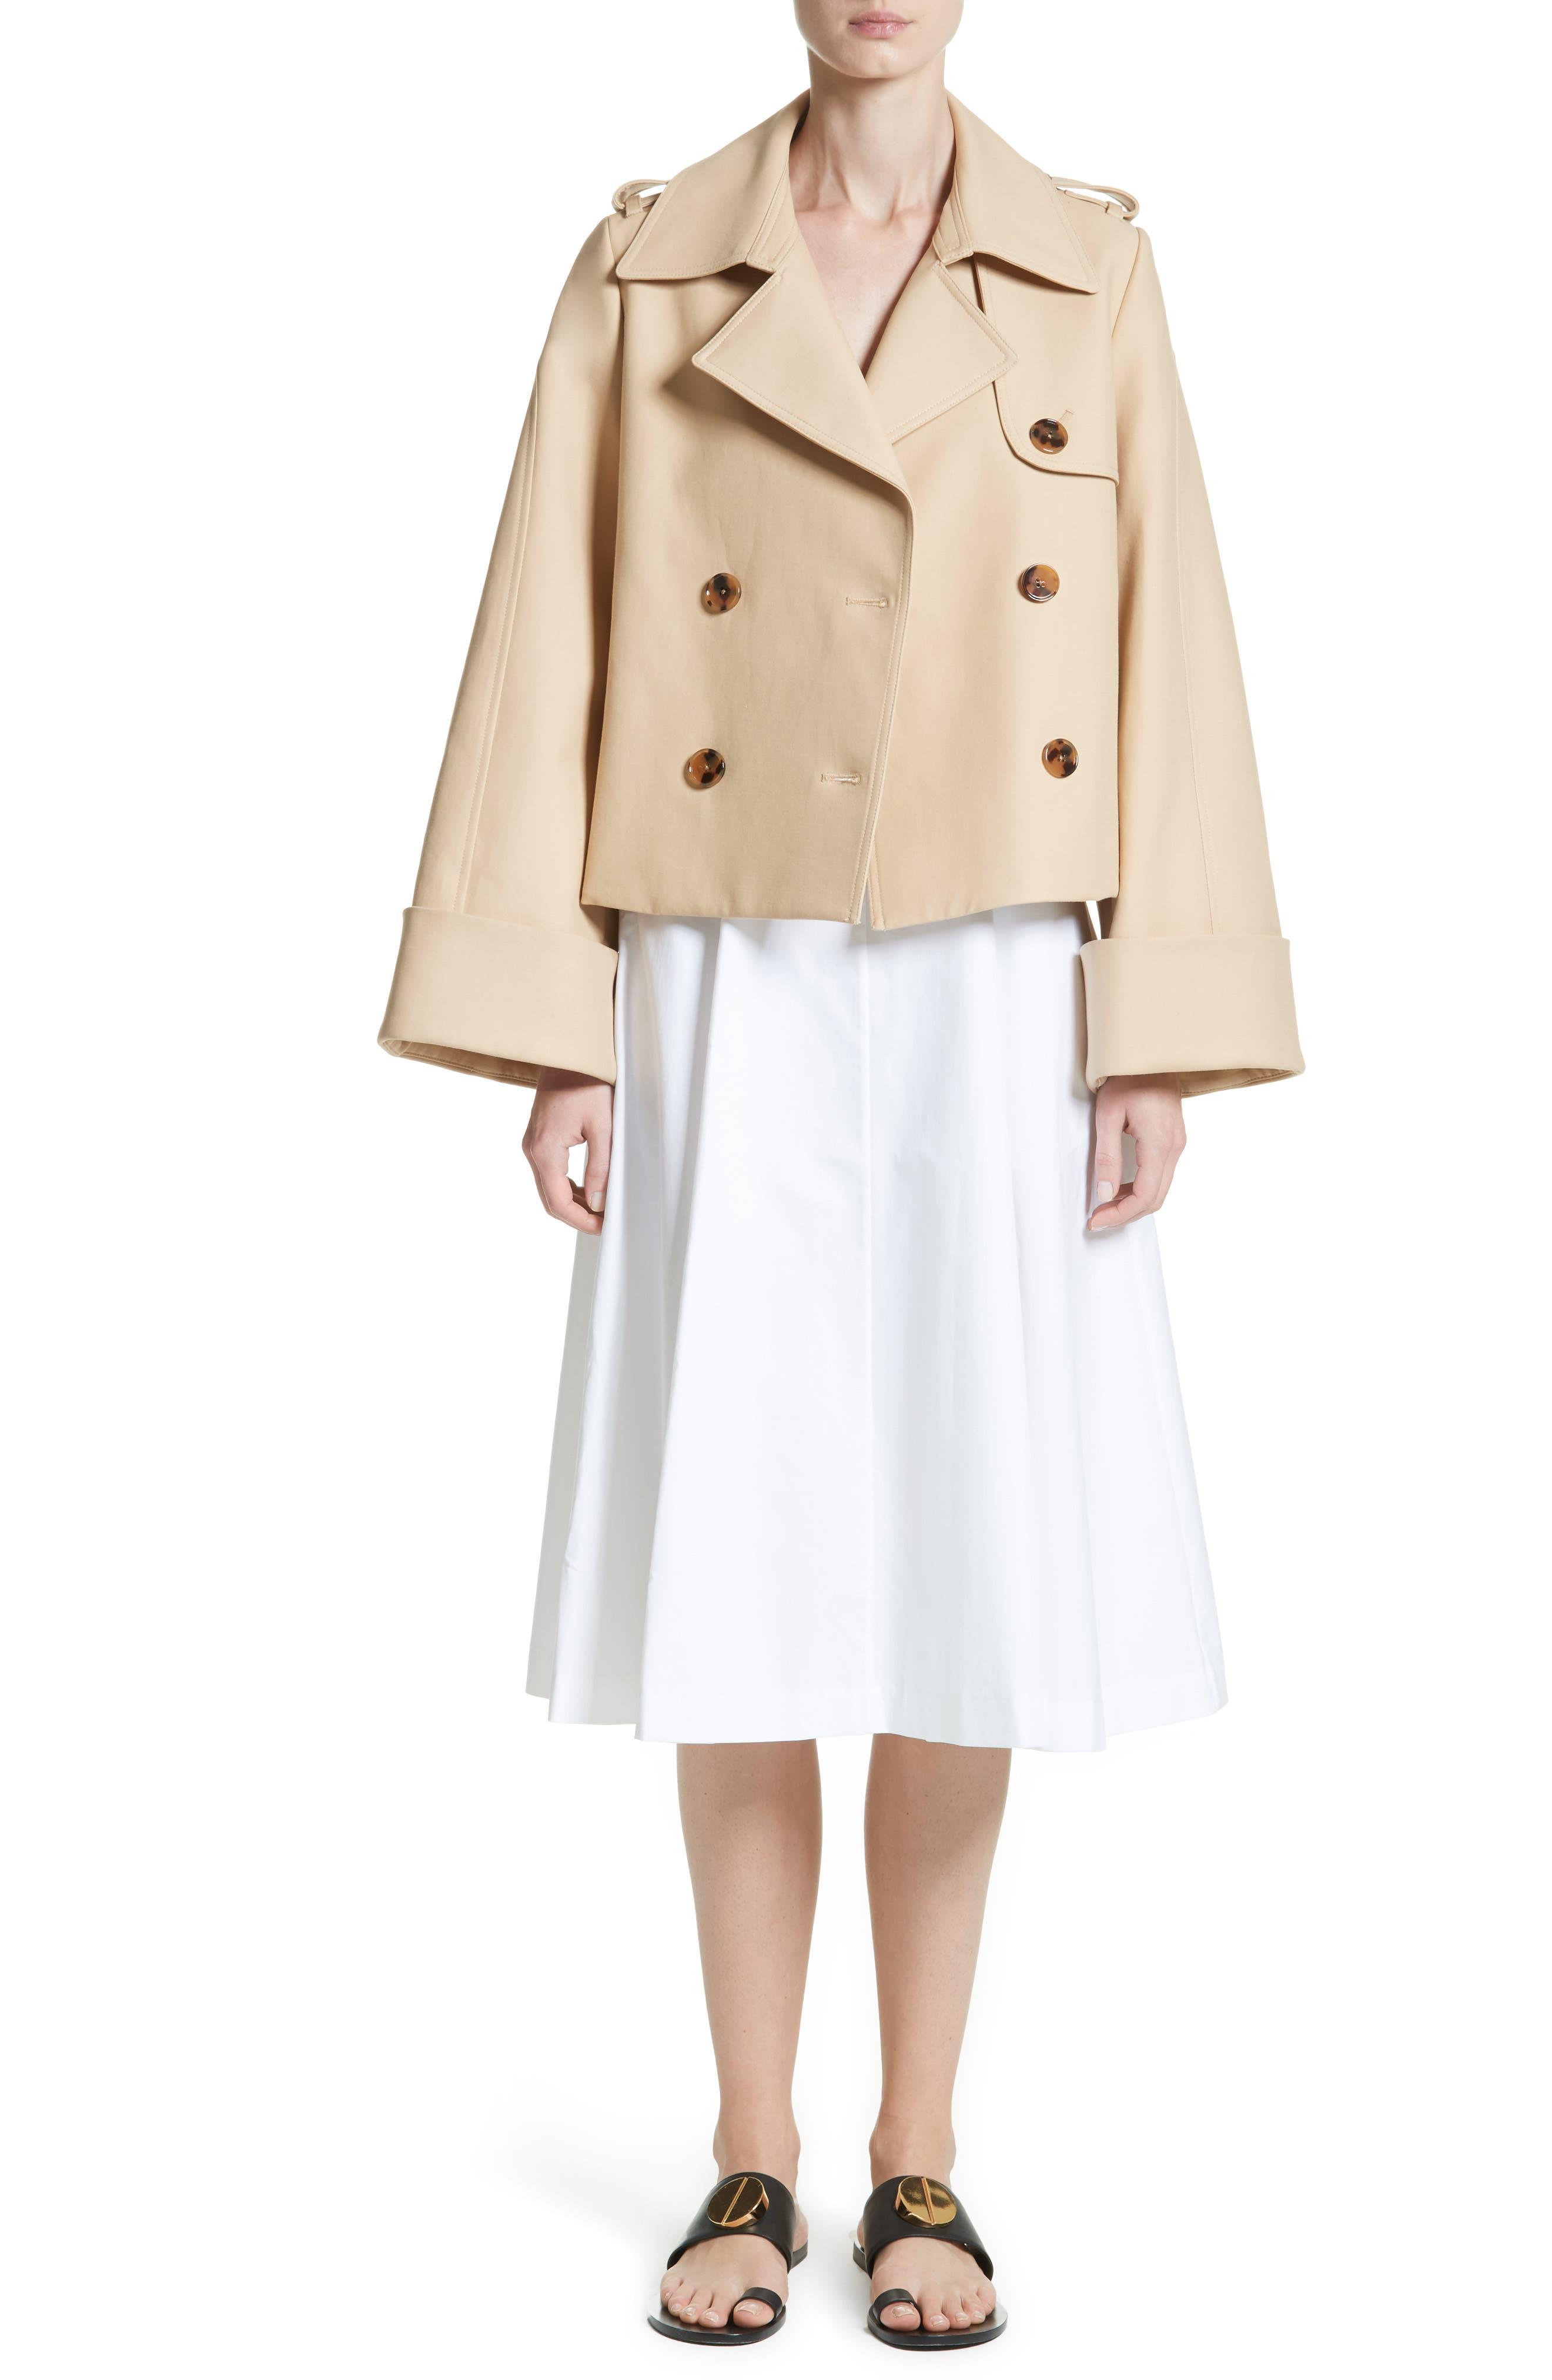 Cindy Poplin Tank Dress,                             Alternate thumbnail 8, color,                             White